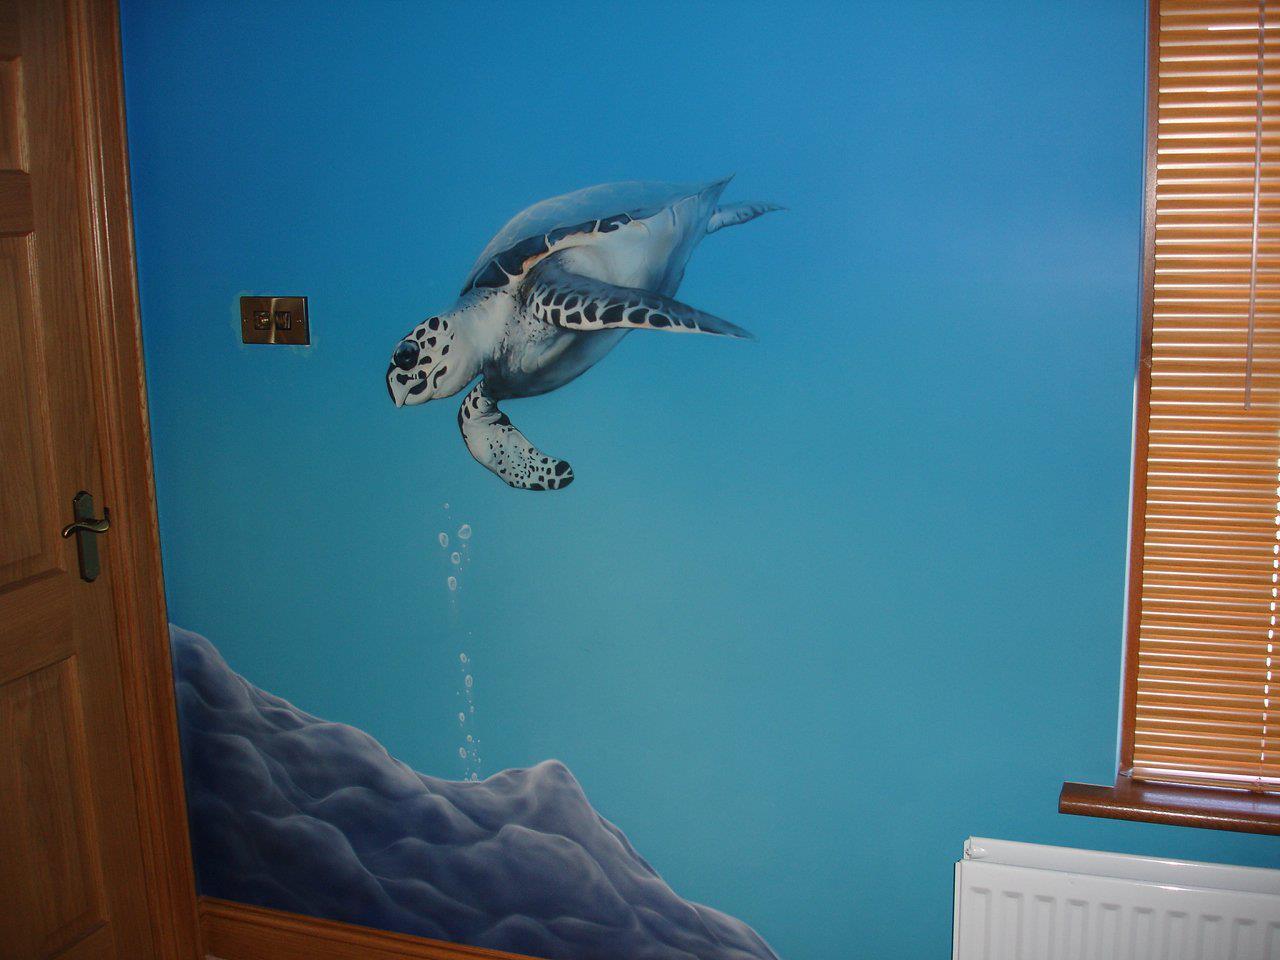 Airbrush Classes Three Day Mural Painting Class